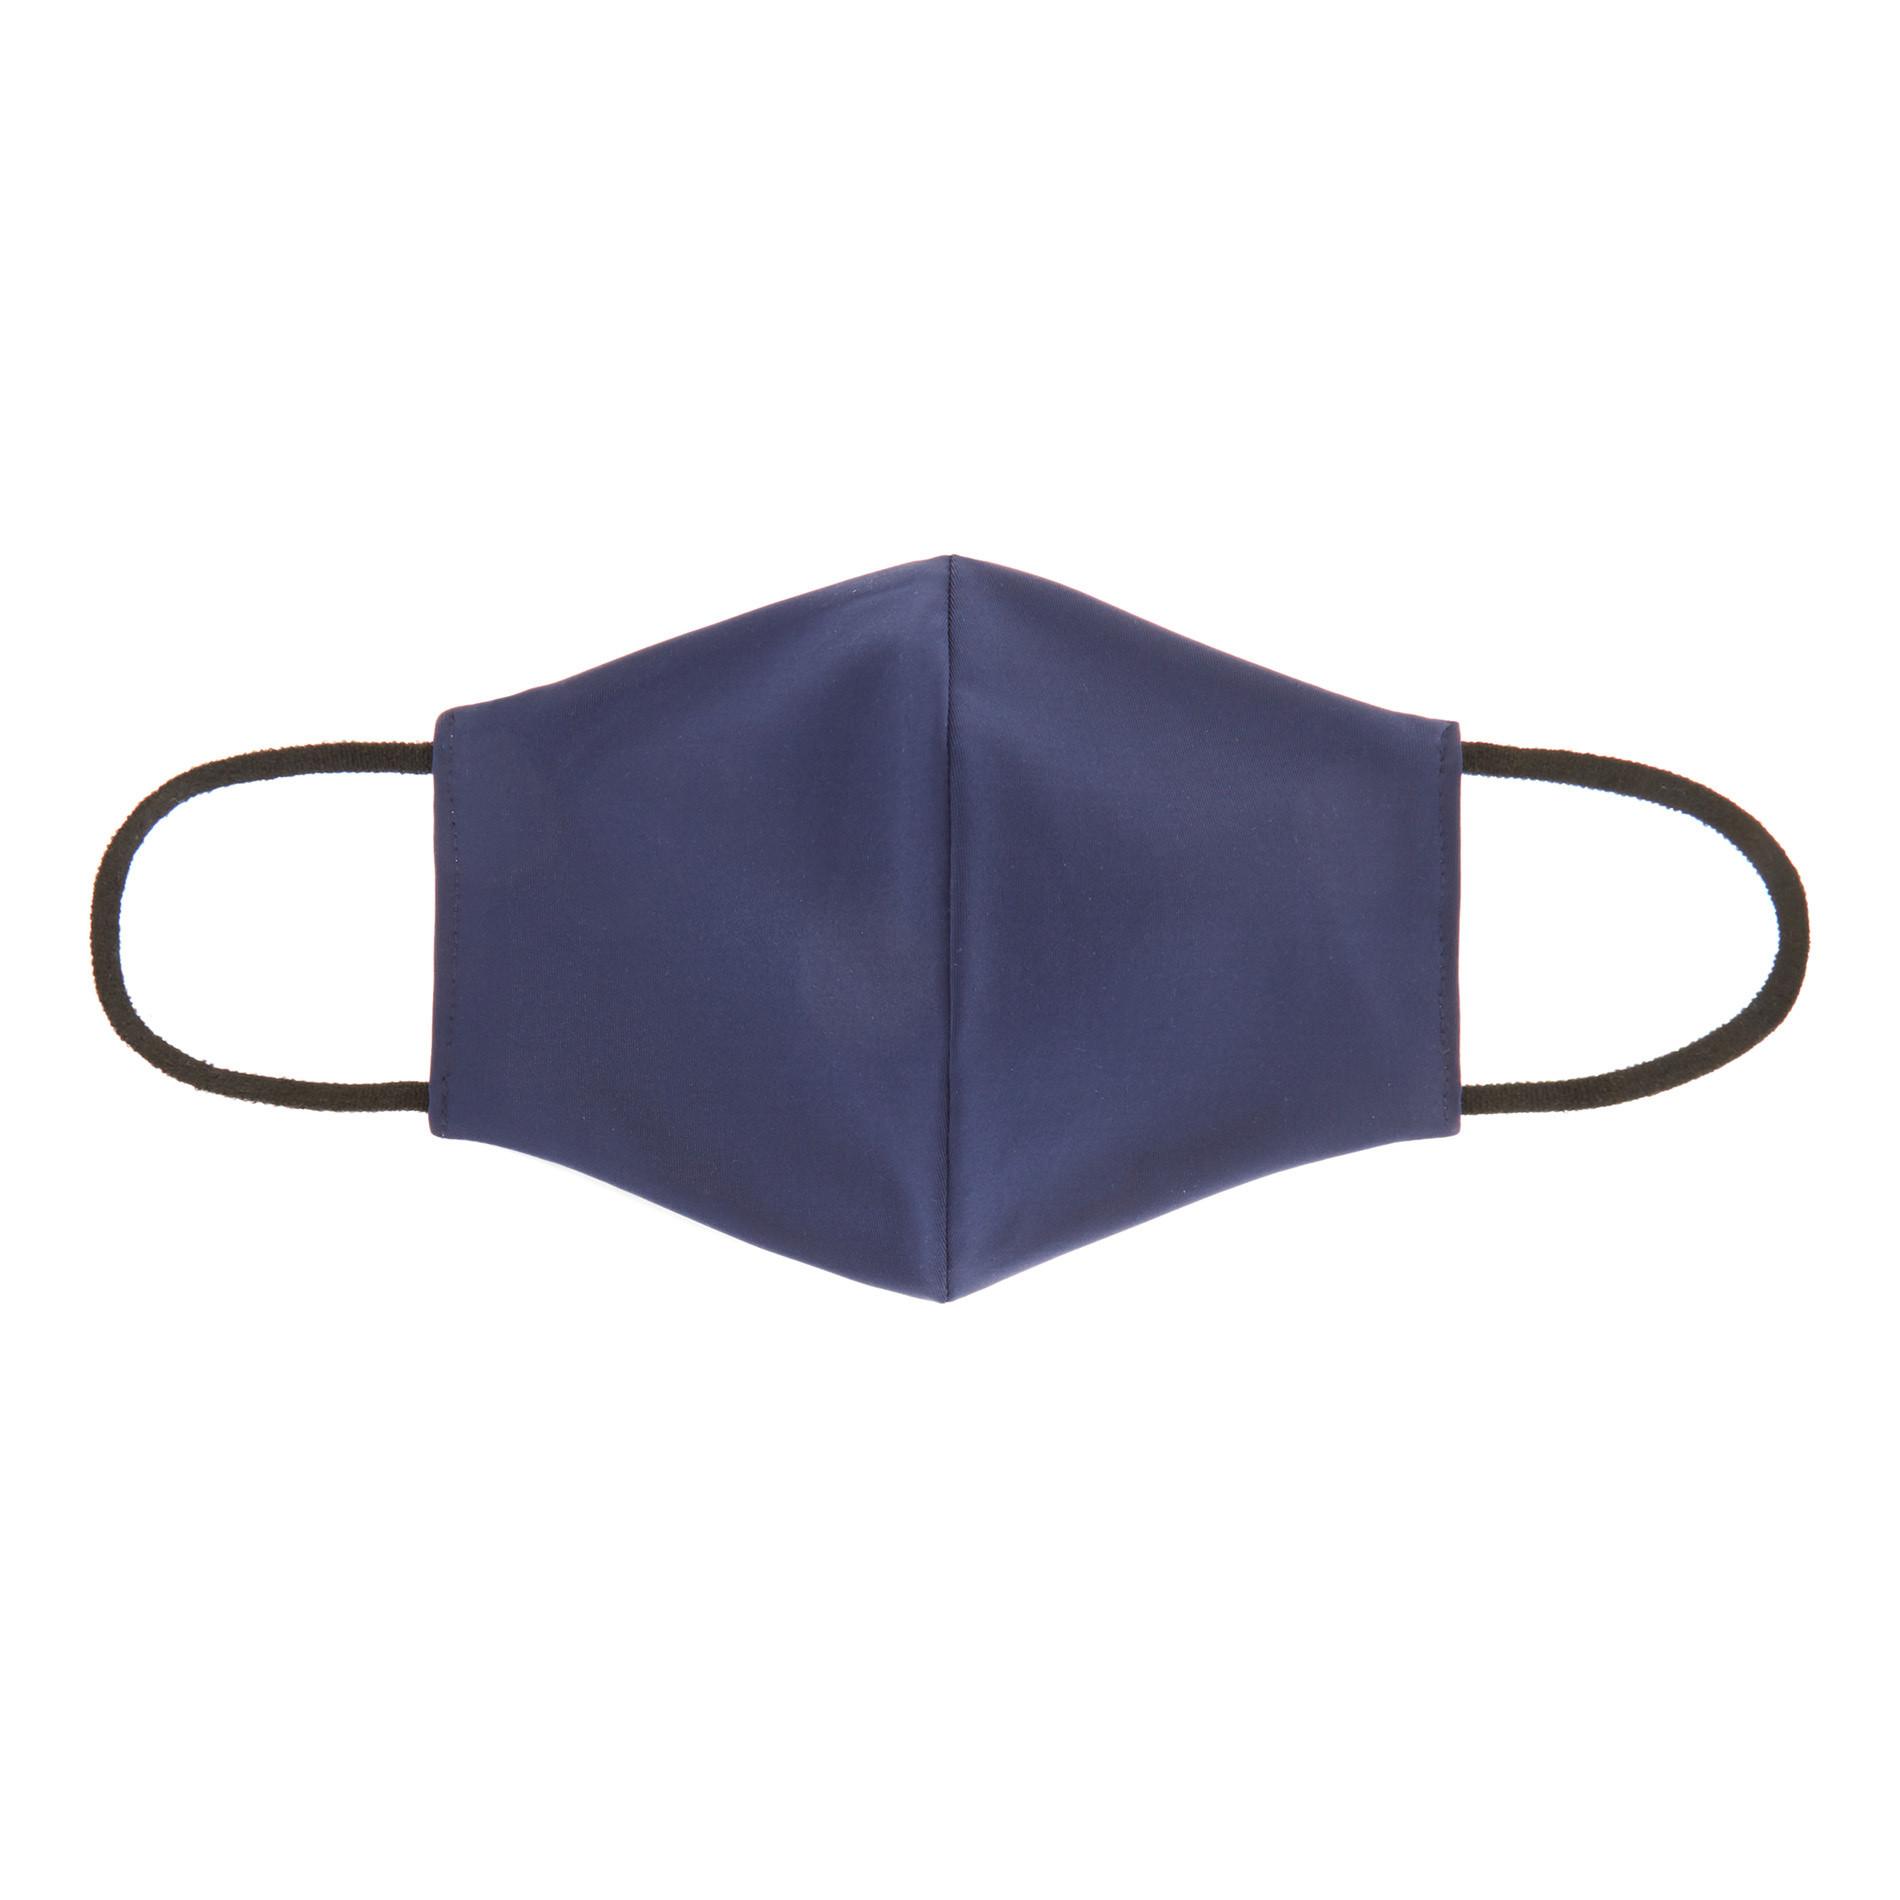 Mascherina lavabile tessuto tinta unita, Blu, large image number 0